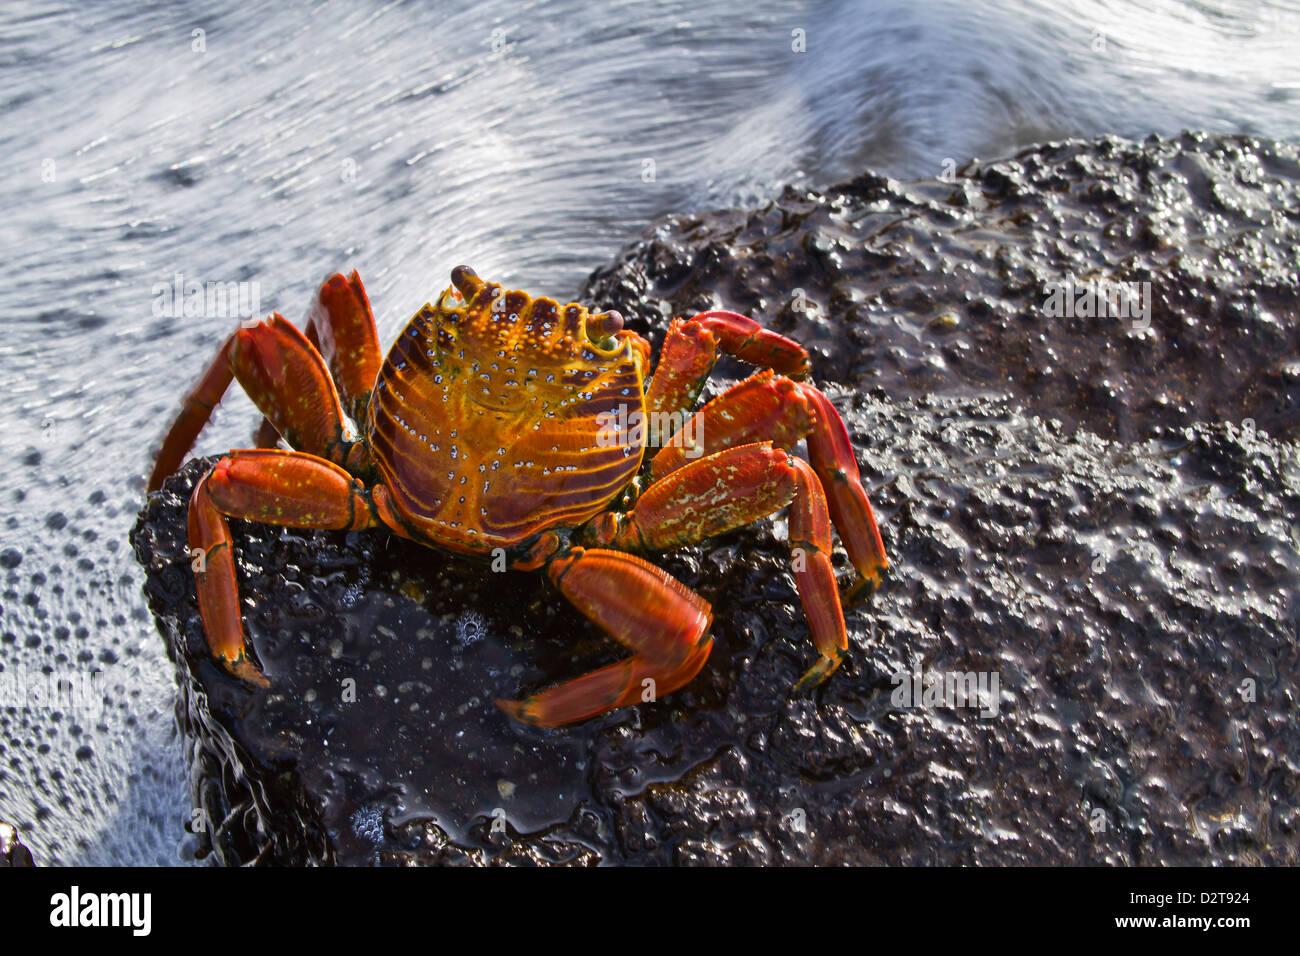 Sally lightfoot crab (Grapsus grapsus), Punta Cormorant, Floreana Island, Galapagos Islands, Ecuador, South America - Stock Image